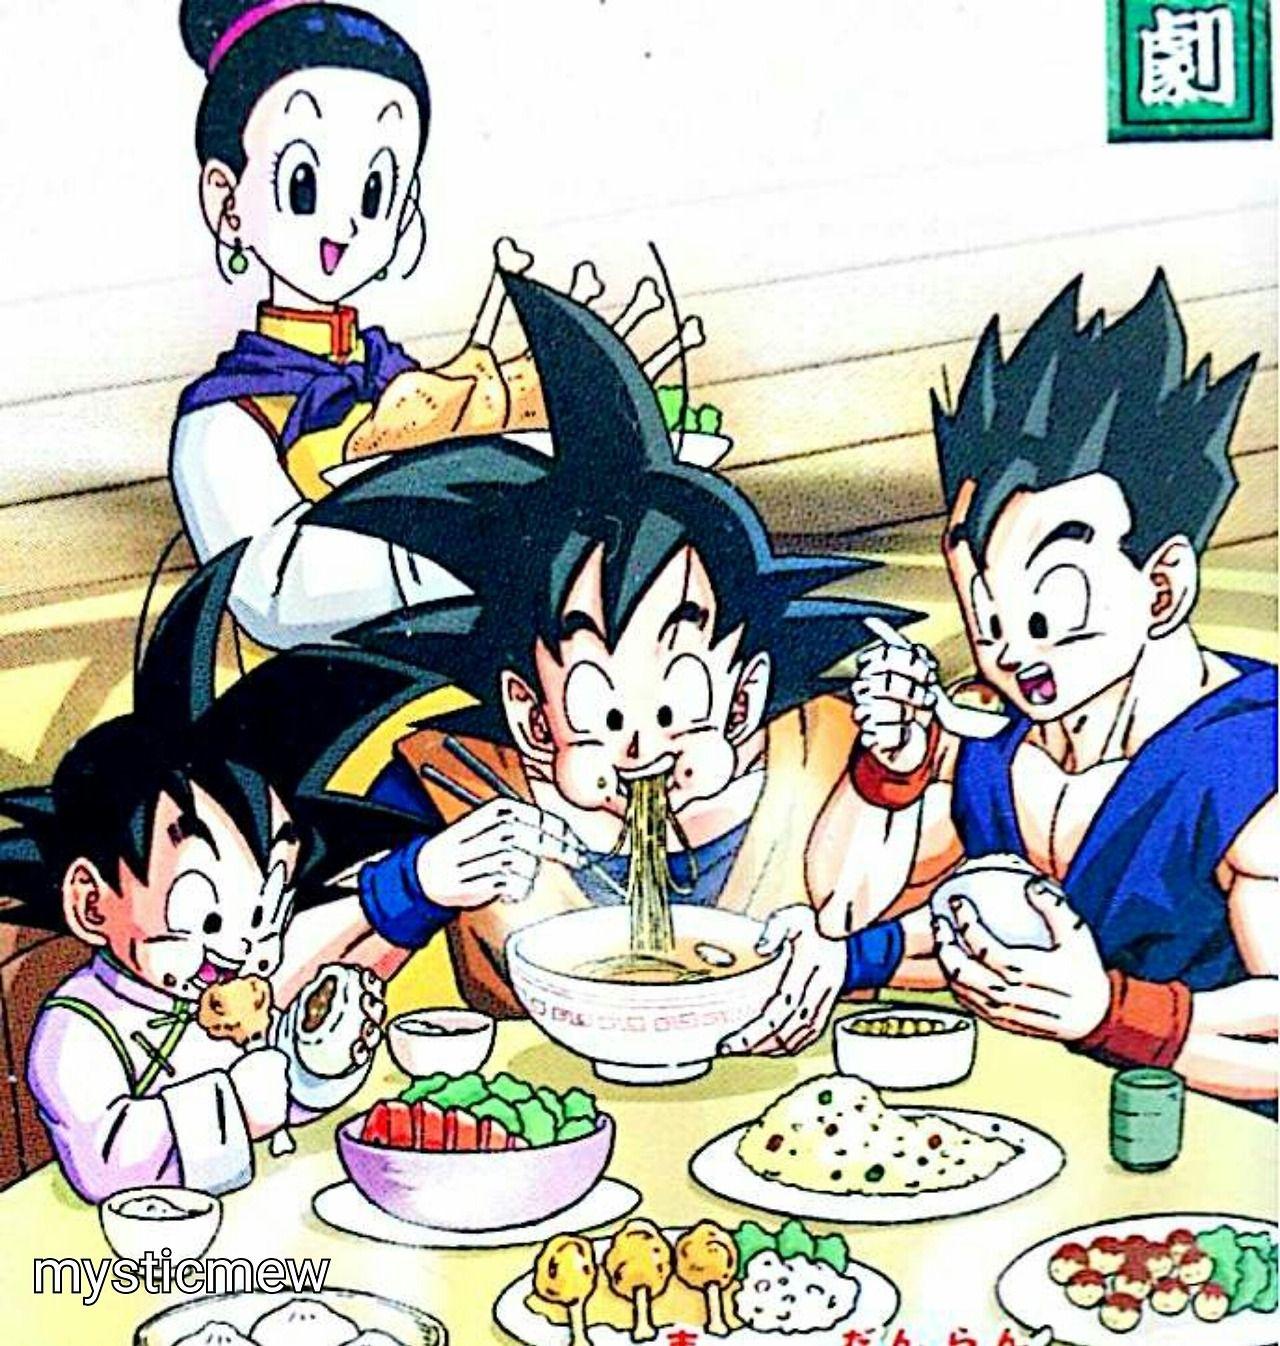 Imagen - Goten y chichi entrenando.jpg | Dragon Ball Wiki